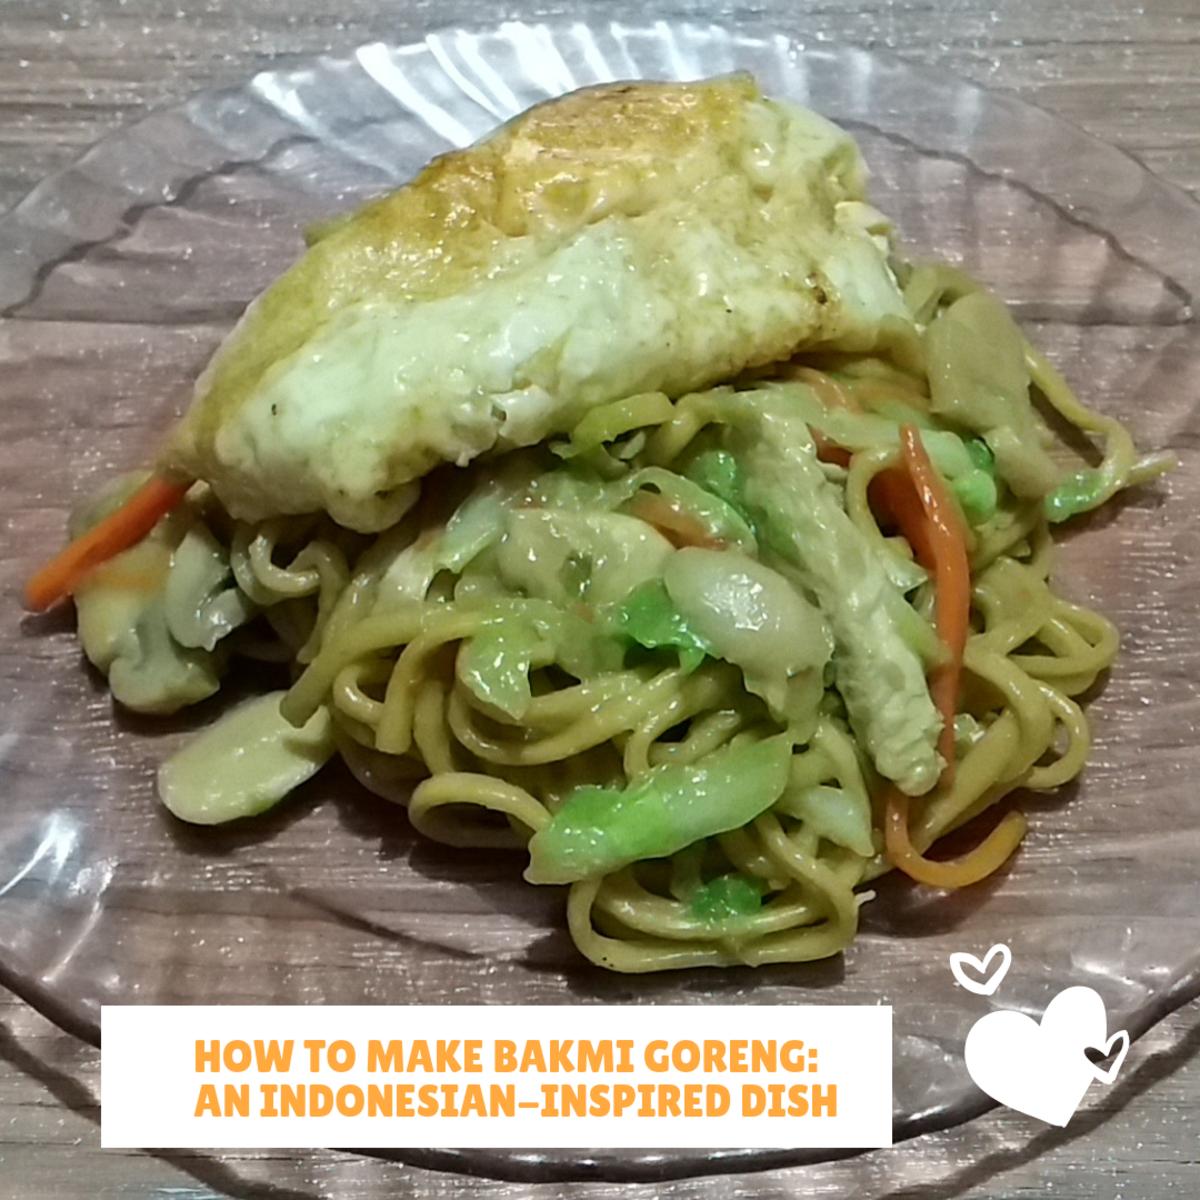 How to Make Bakmi Goreng: An Indonesian-Inspired Dish